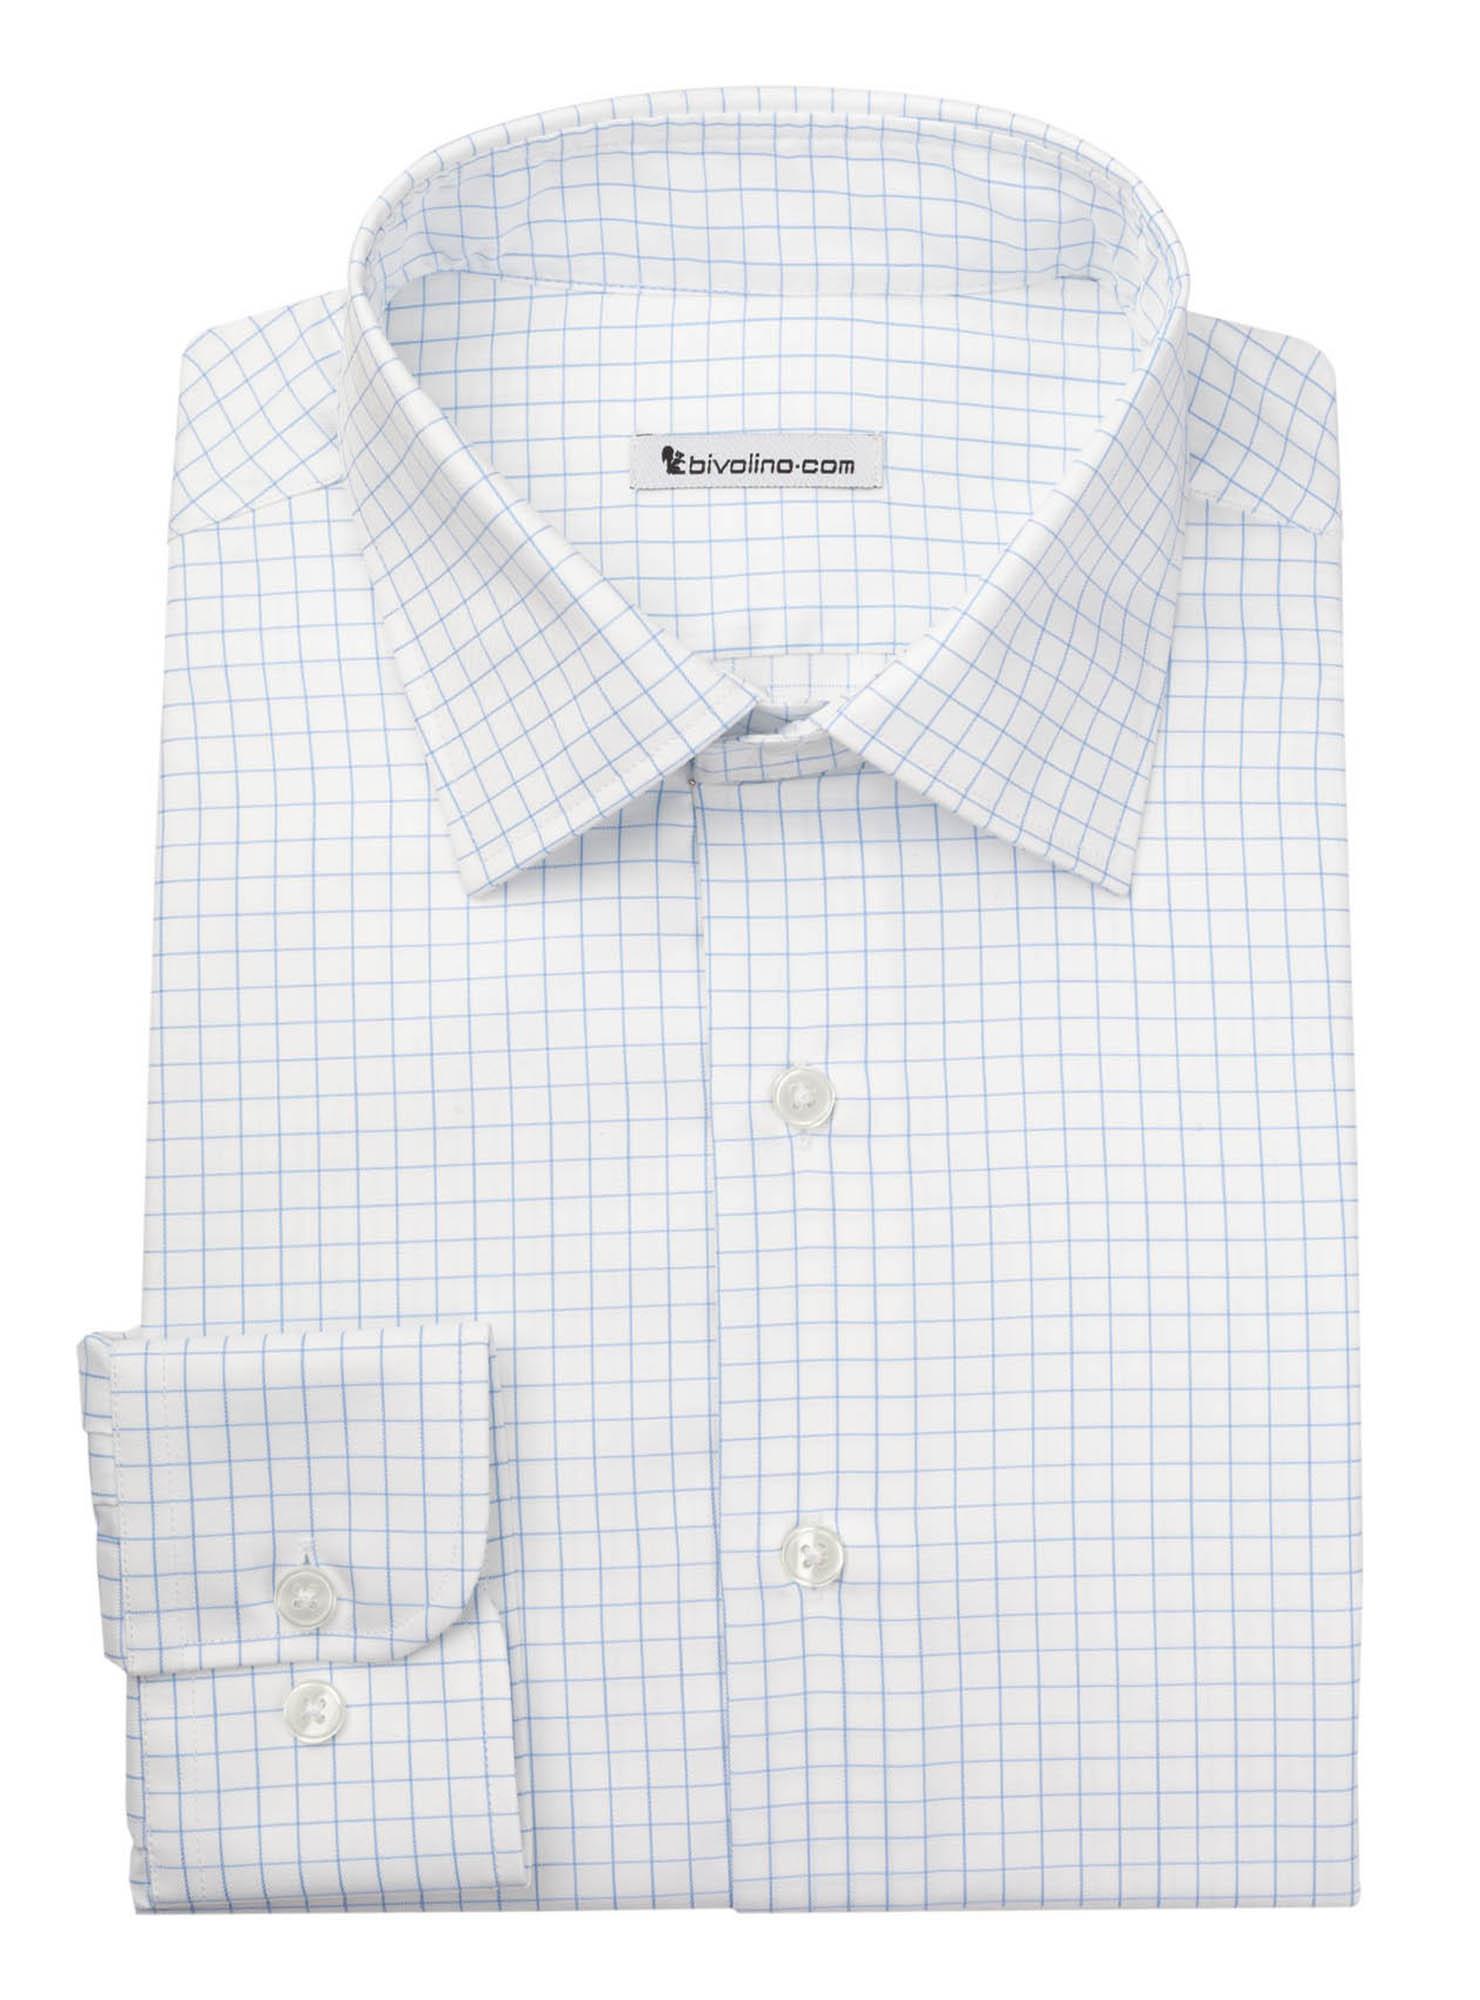 MACANNO - Men's shrt cotton 2ply - DARCI 4